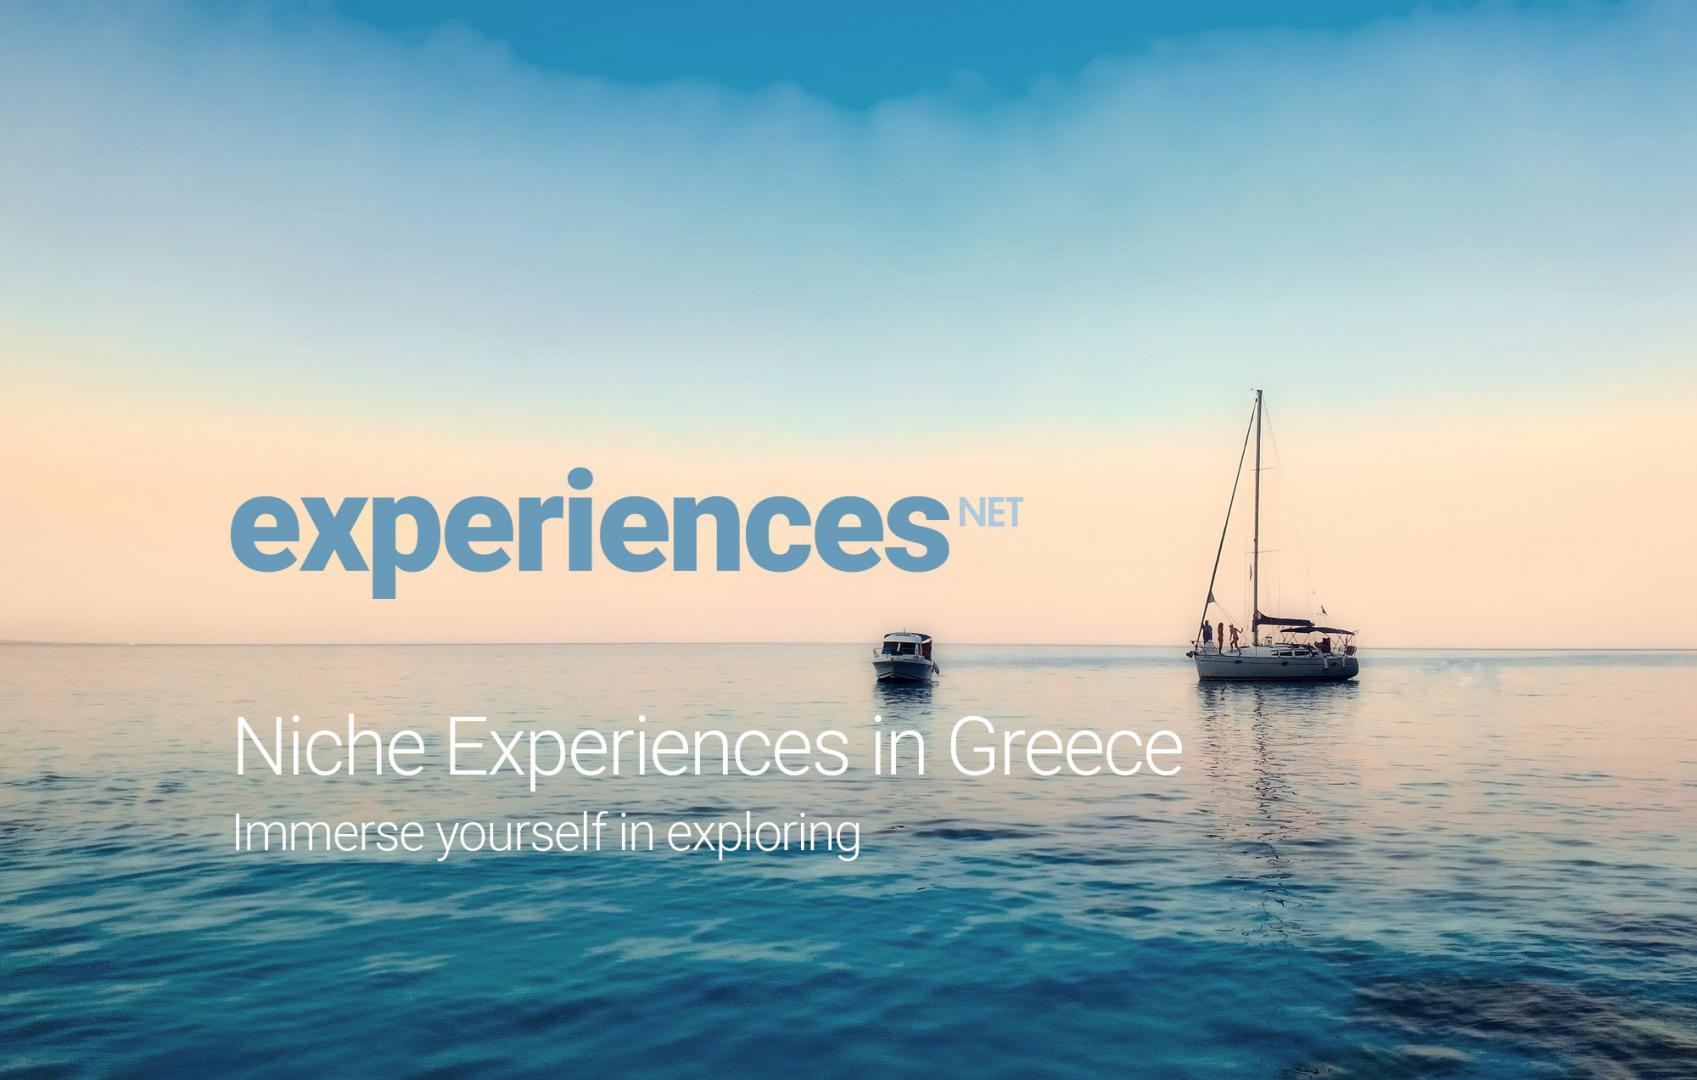 EXPERIENCES NET